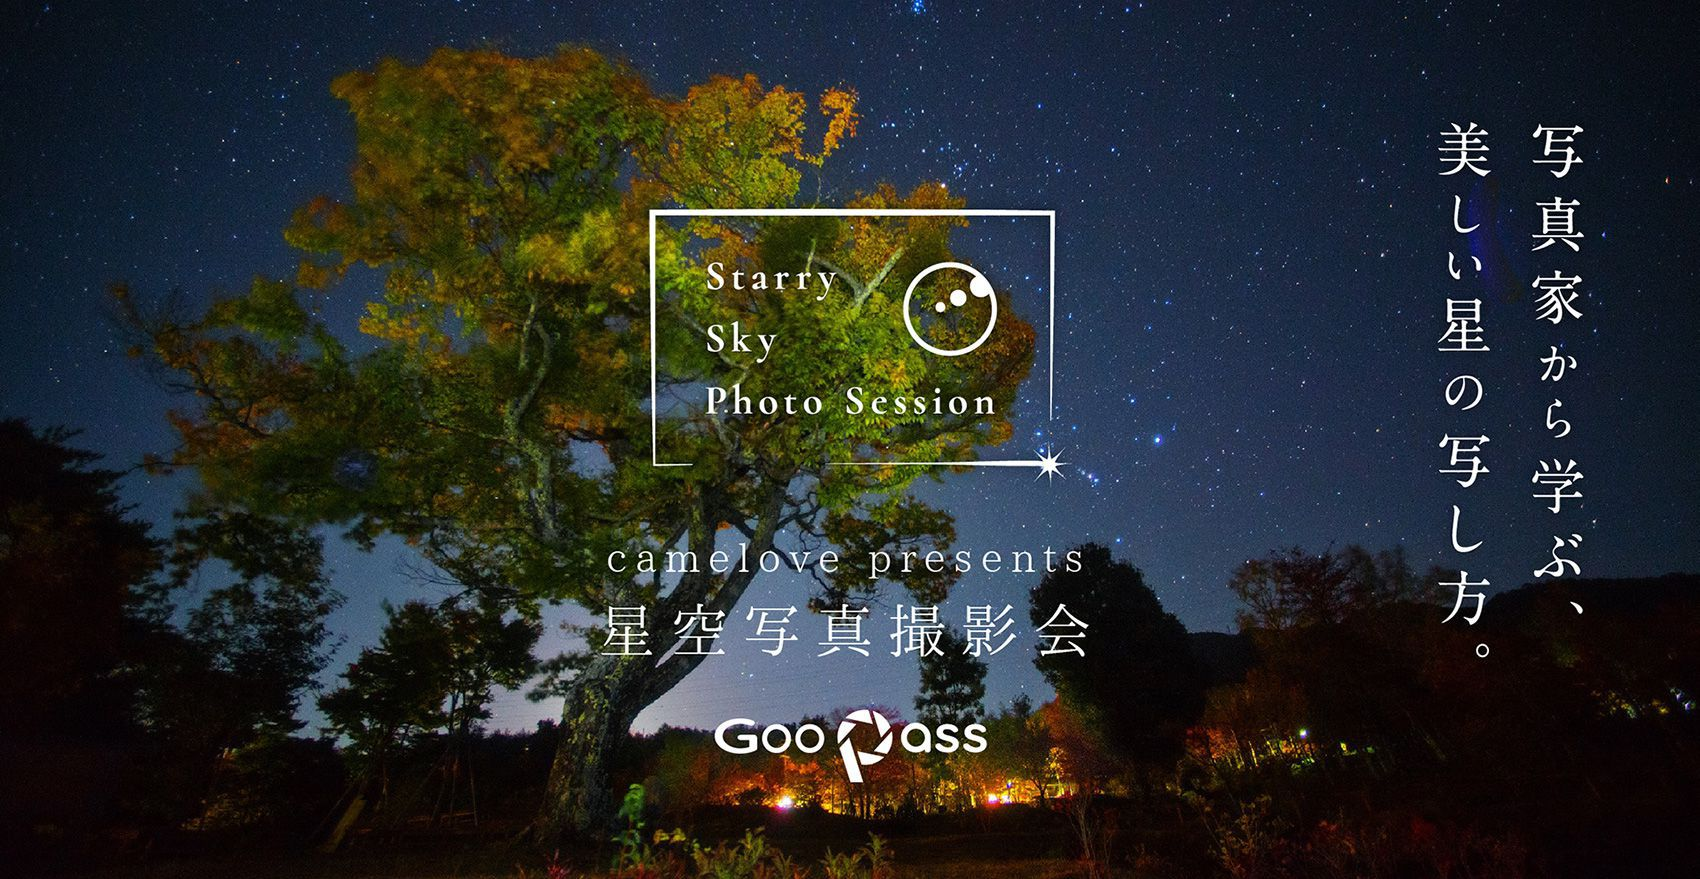 camelove presents 星空写真撮影会